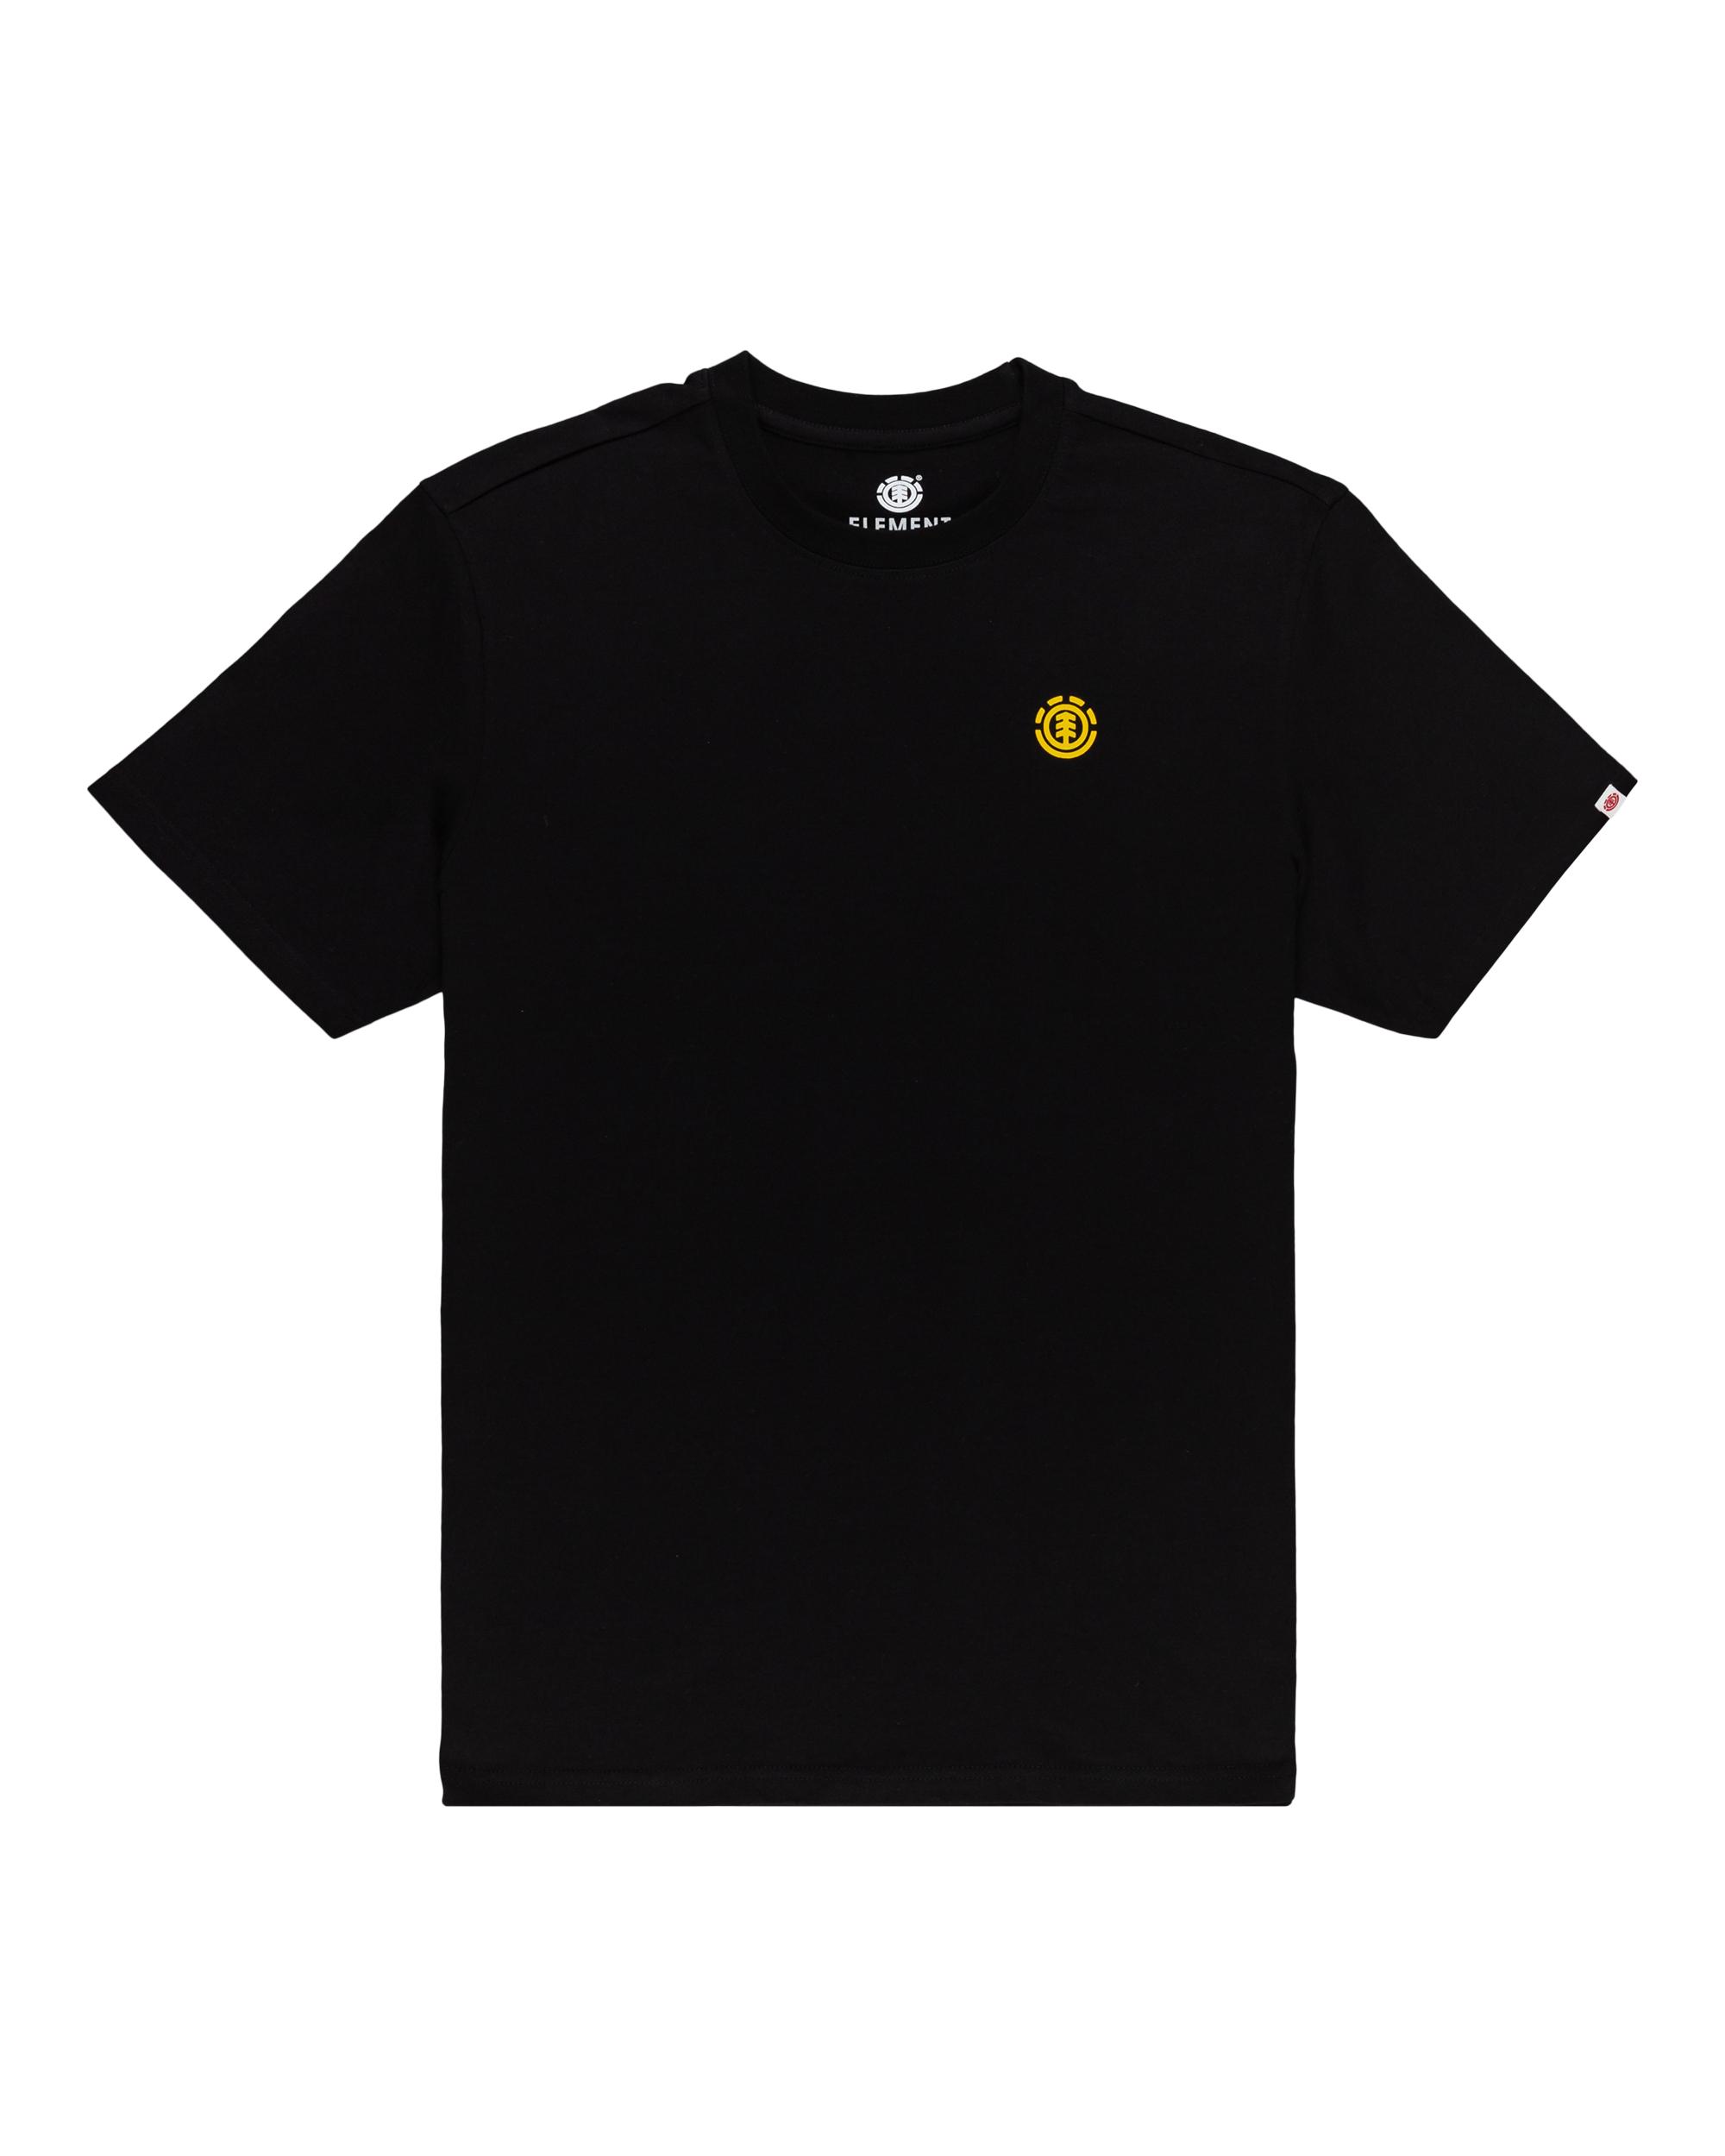 Element Foxwood t-shirt, black, medium